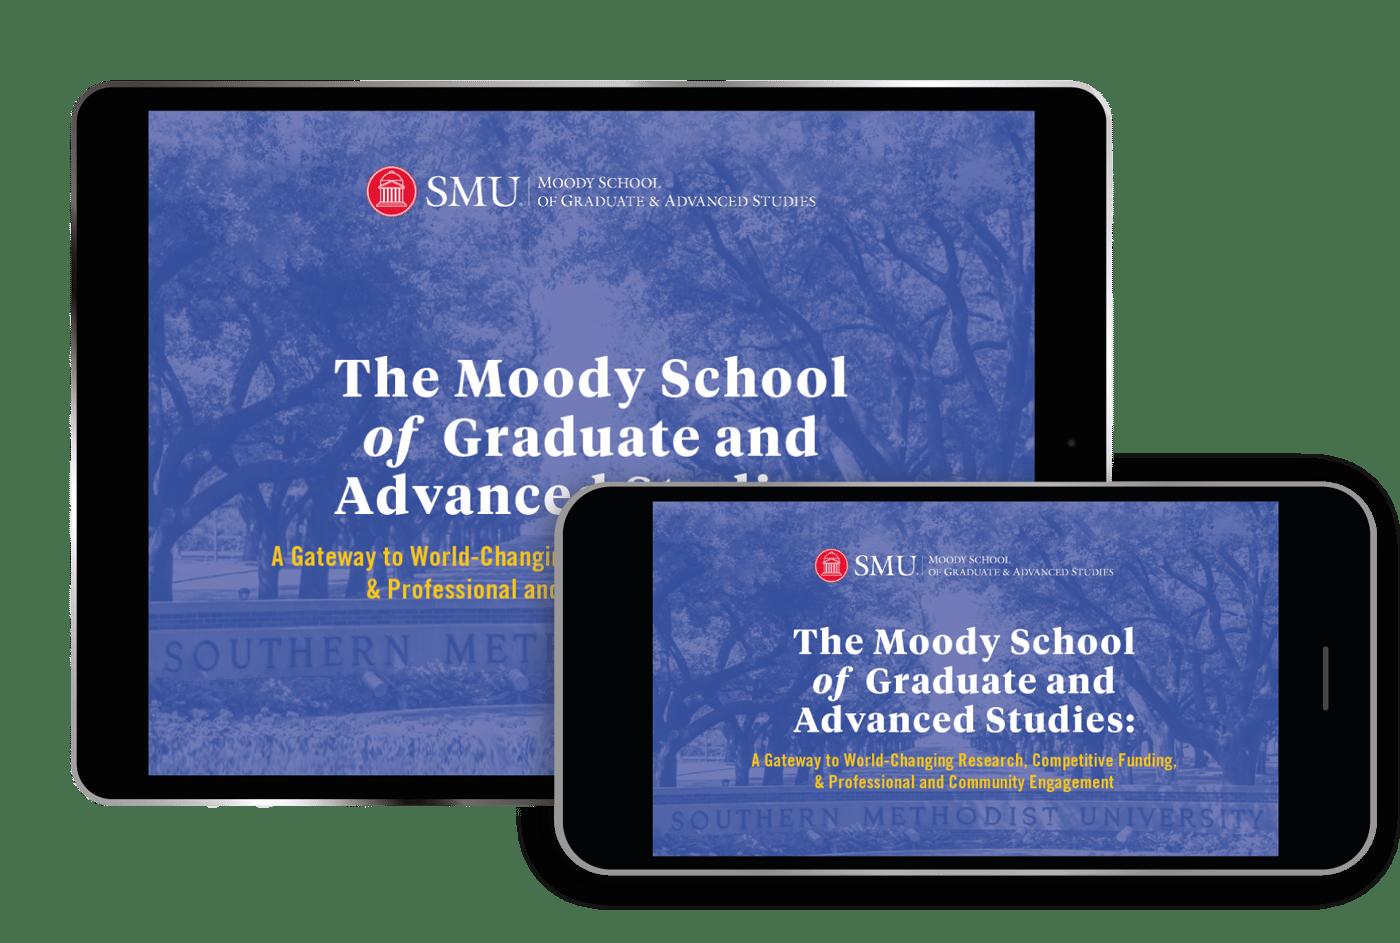 853524_-Shannon- -SMU- Moody School eBook_mockup2_102920